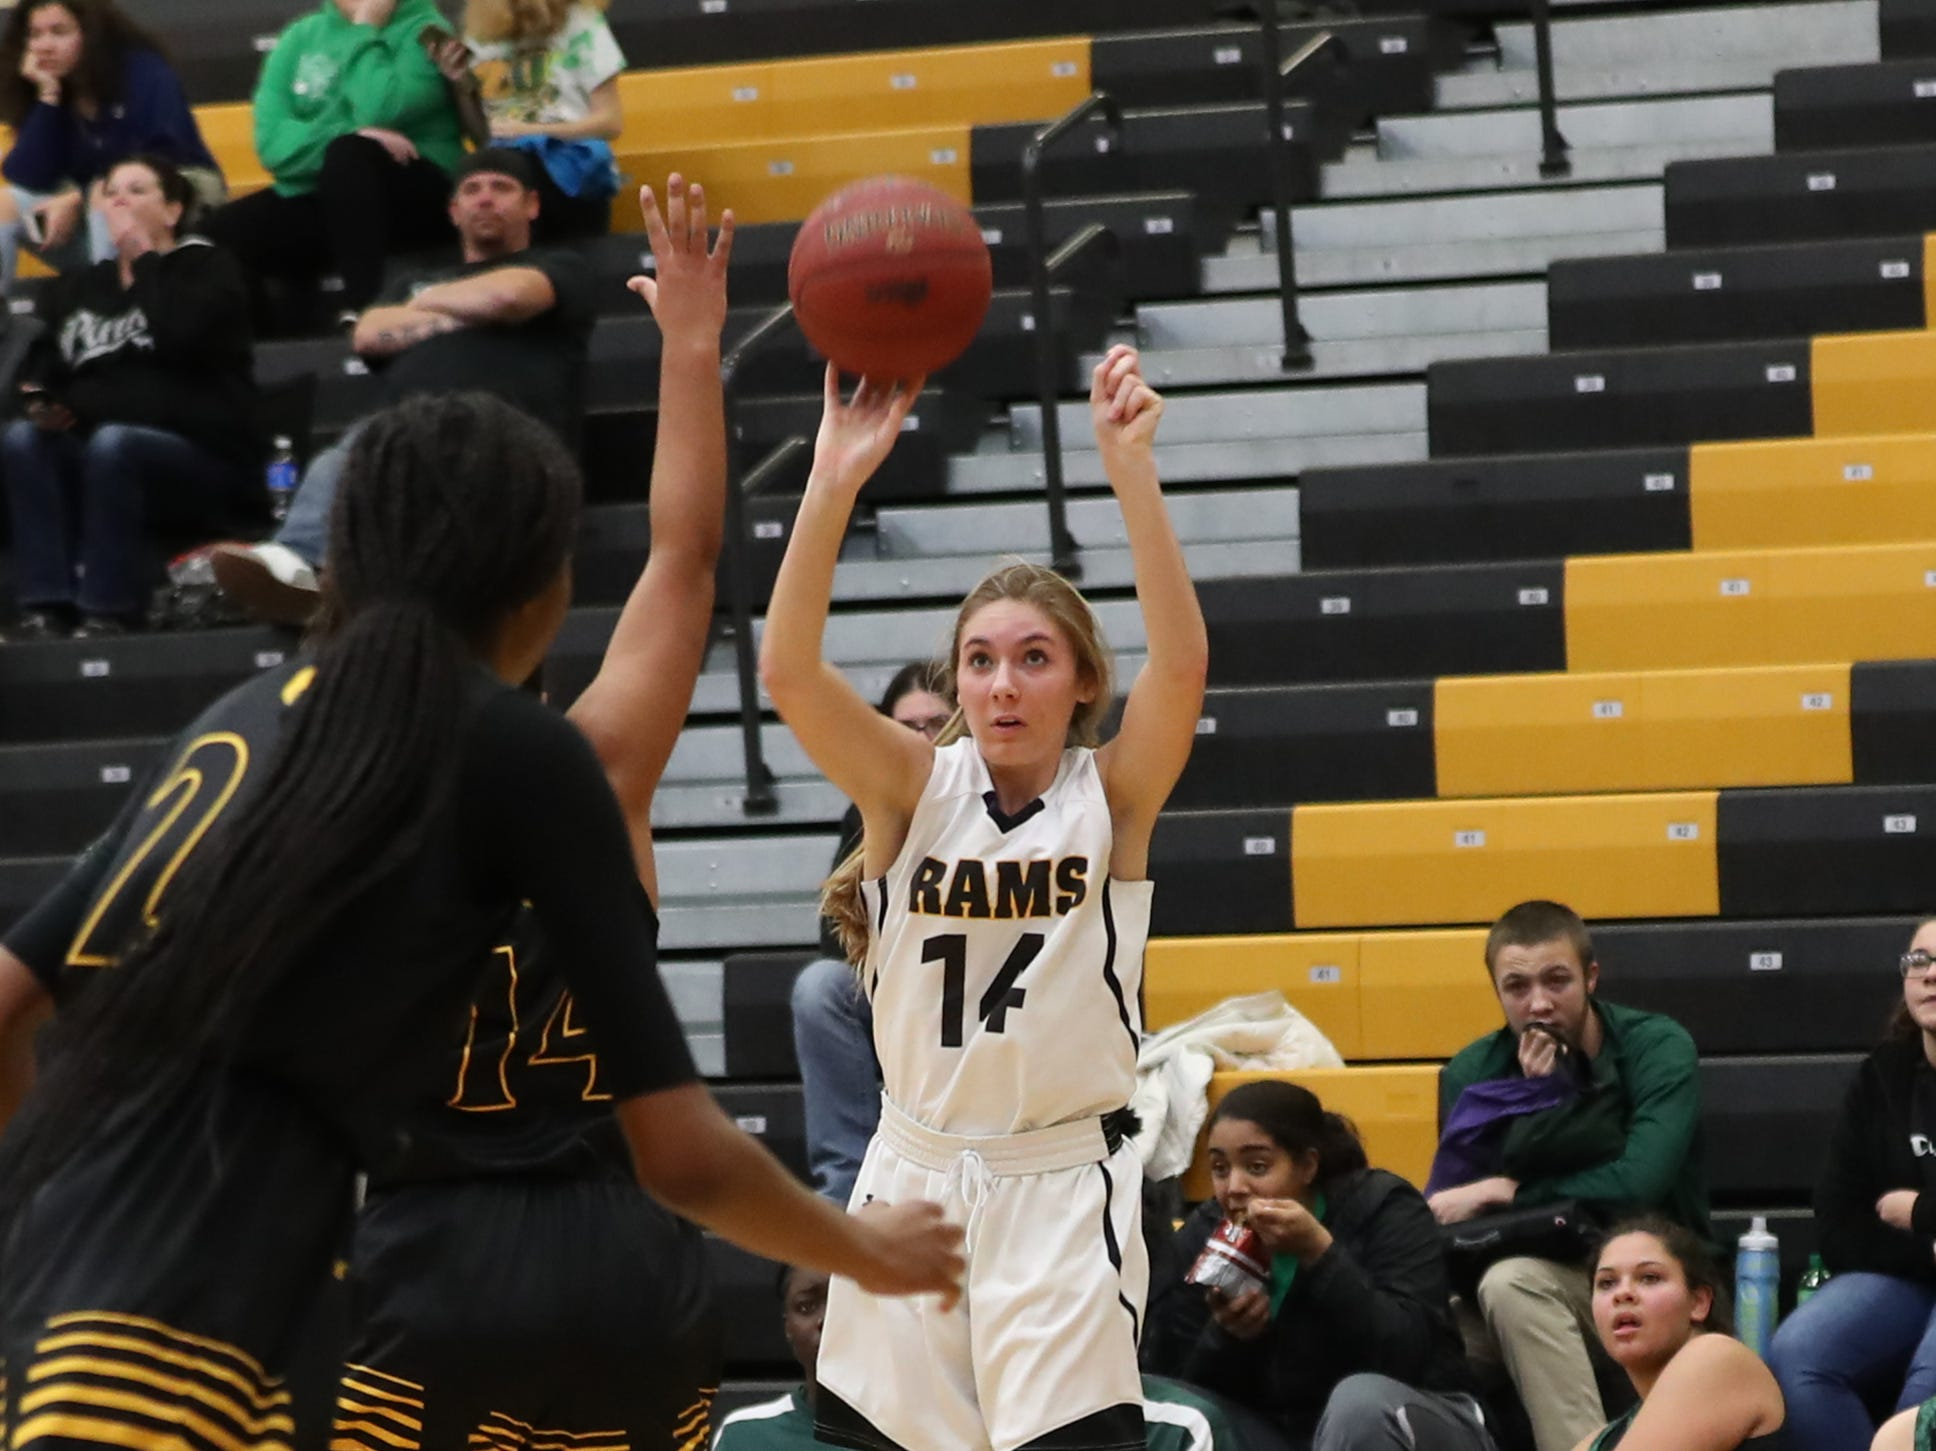 Southeast Polk Rams Jessica Stuart (14) shoots a three pointer against the Hoover Huskies at Southeast Polk High School.